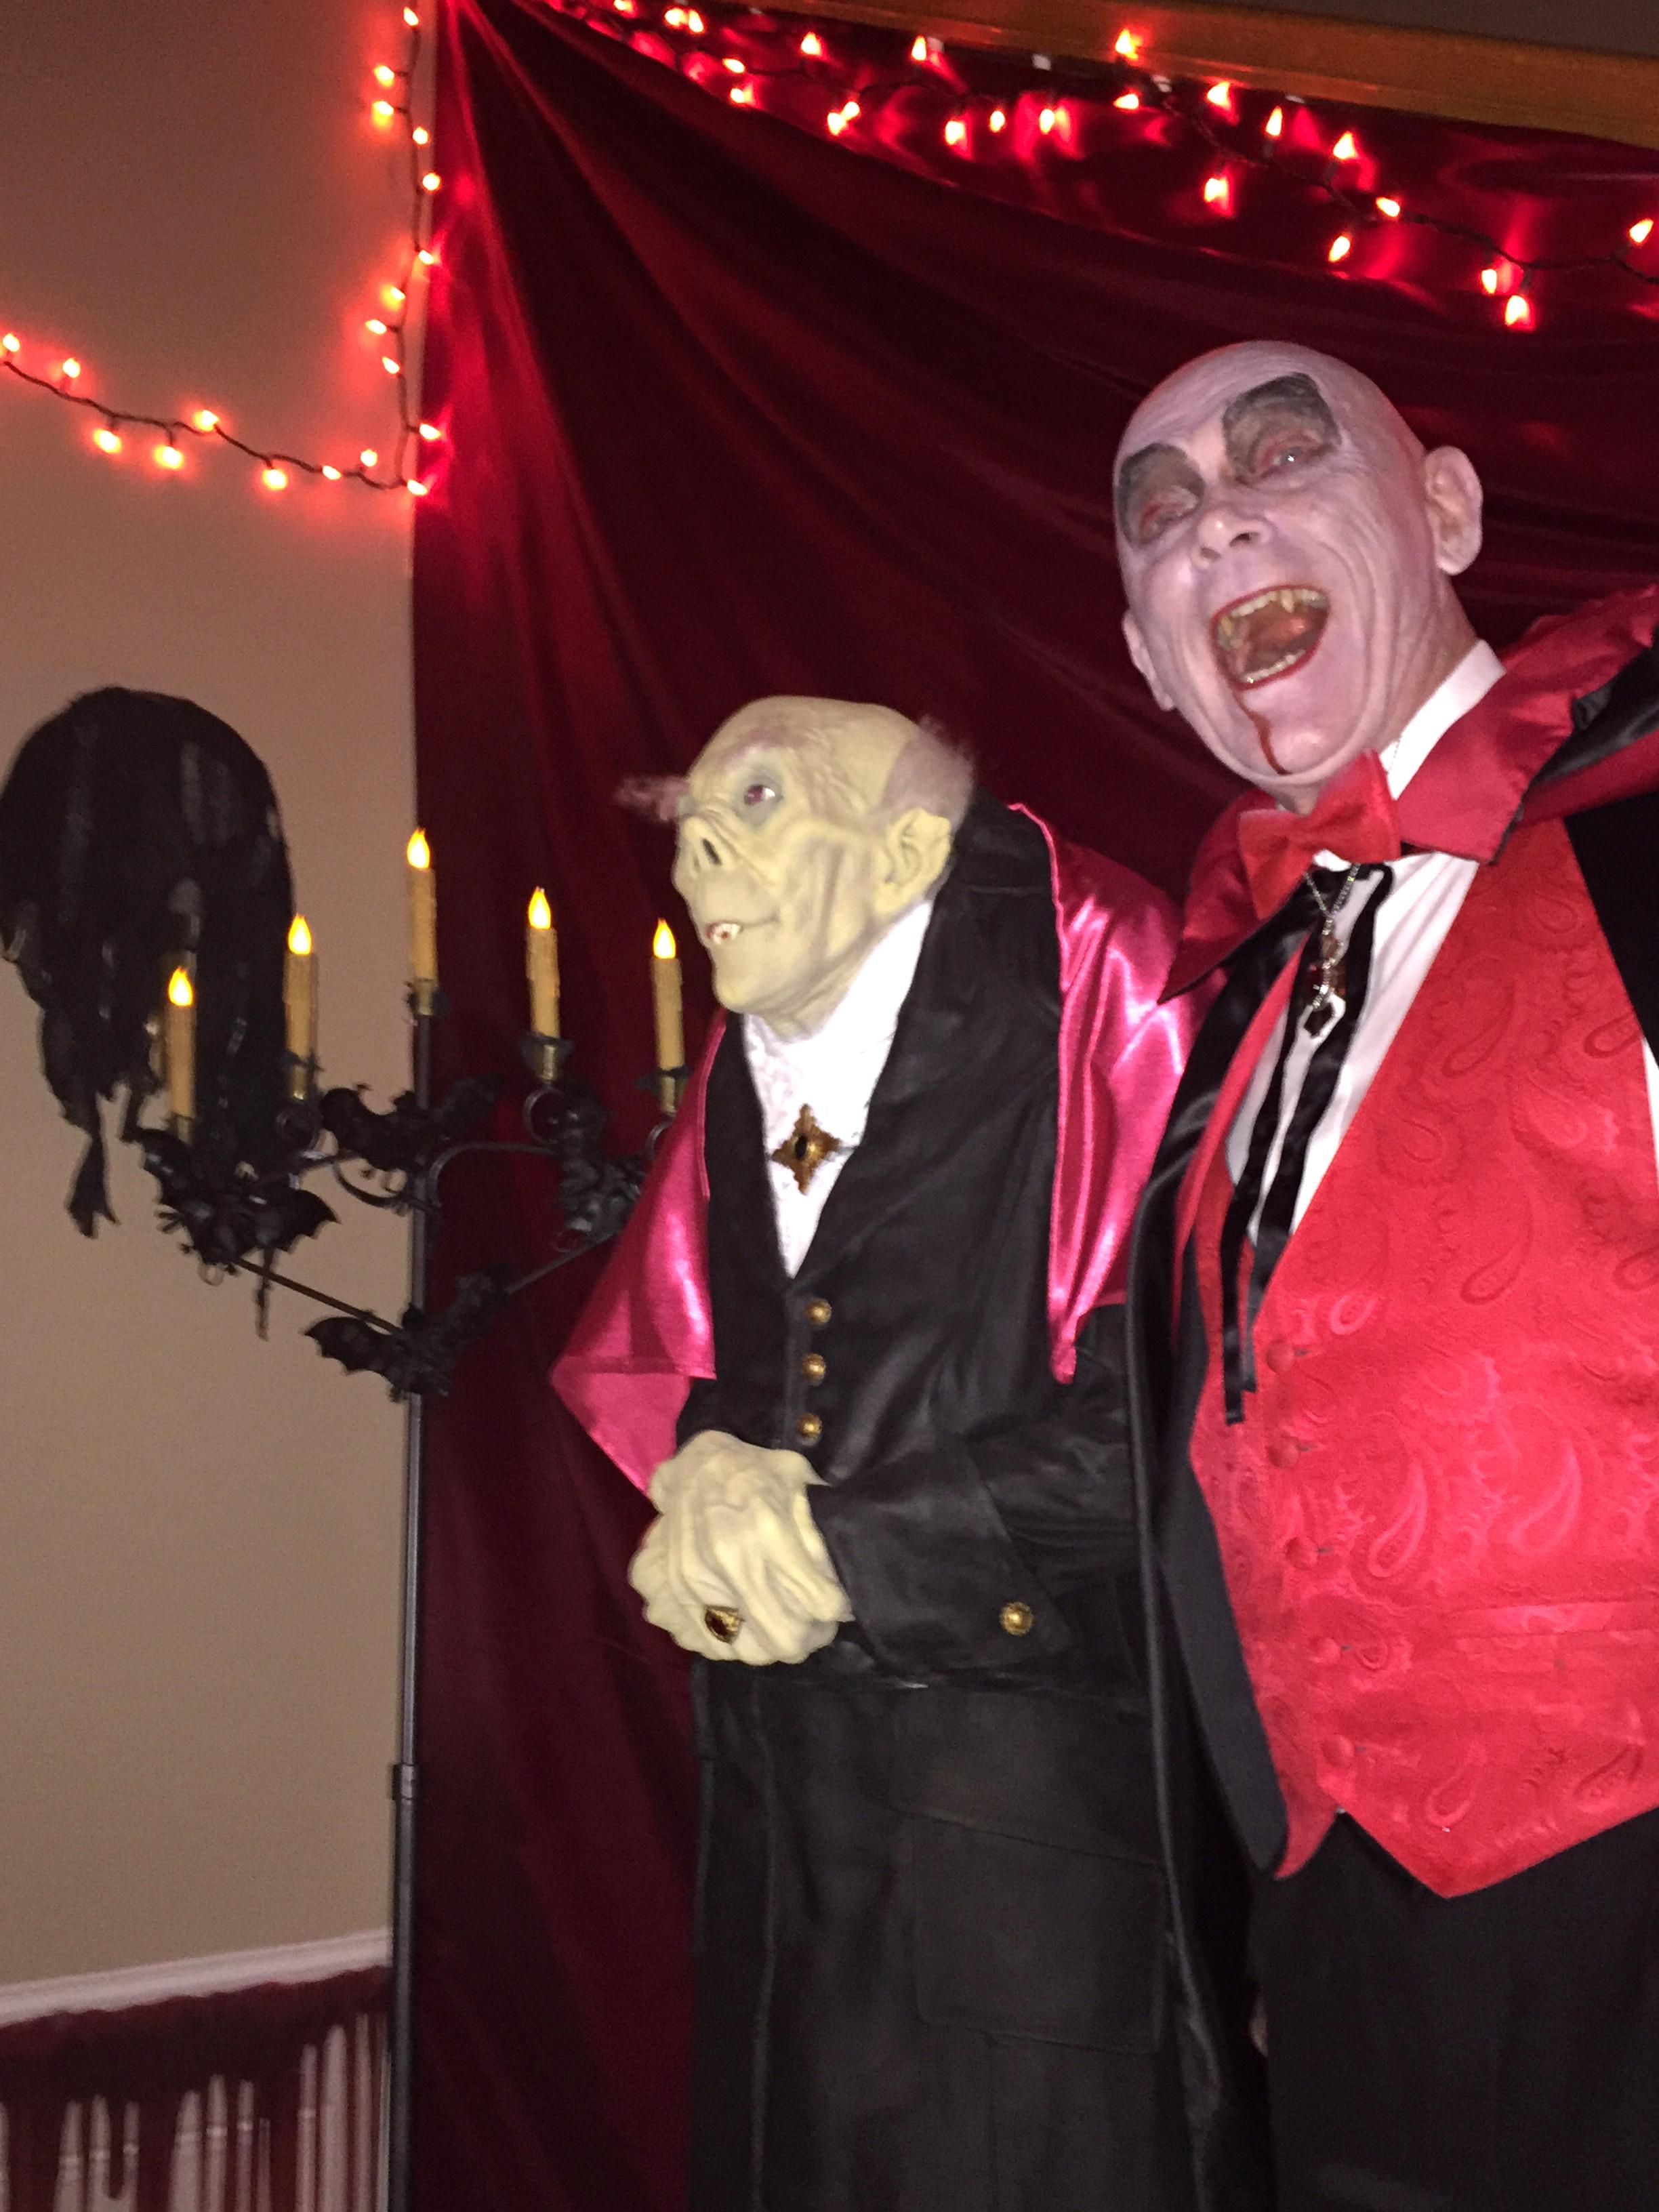 Count Dracu-West & his pal, Mr. Hyde